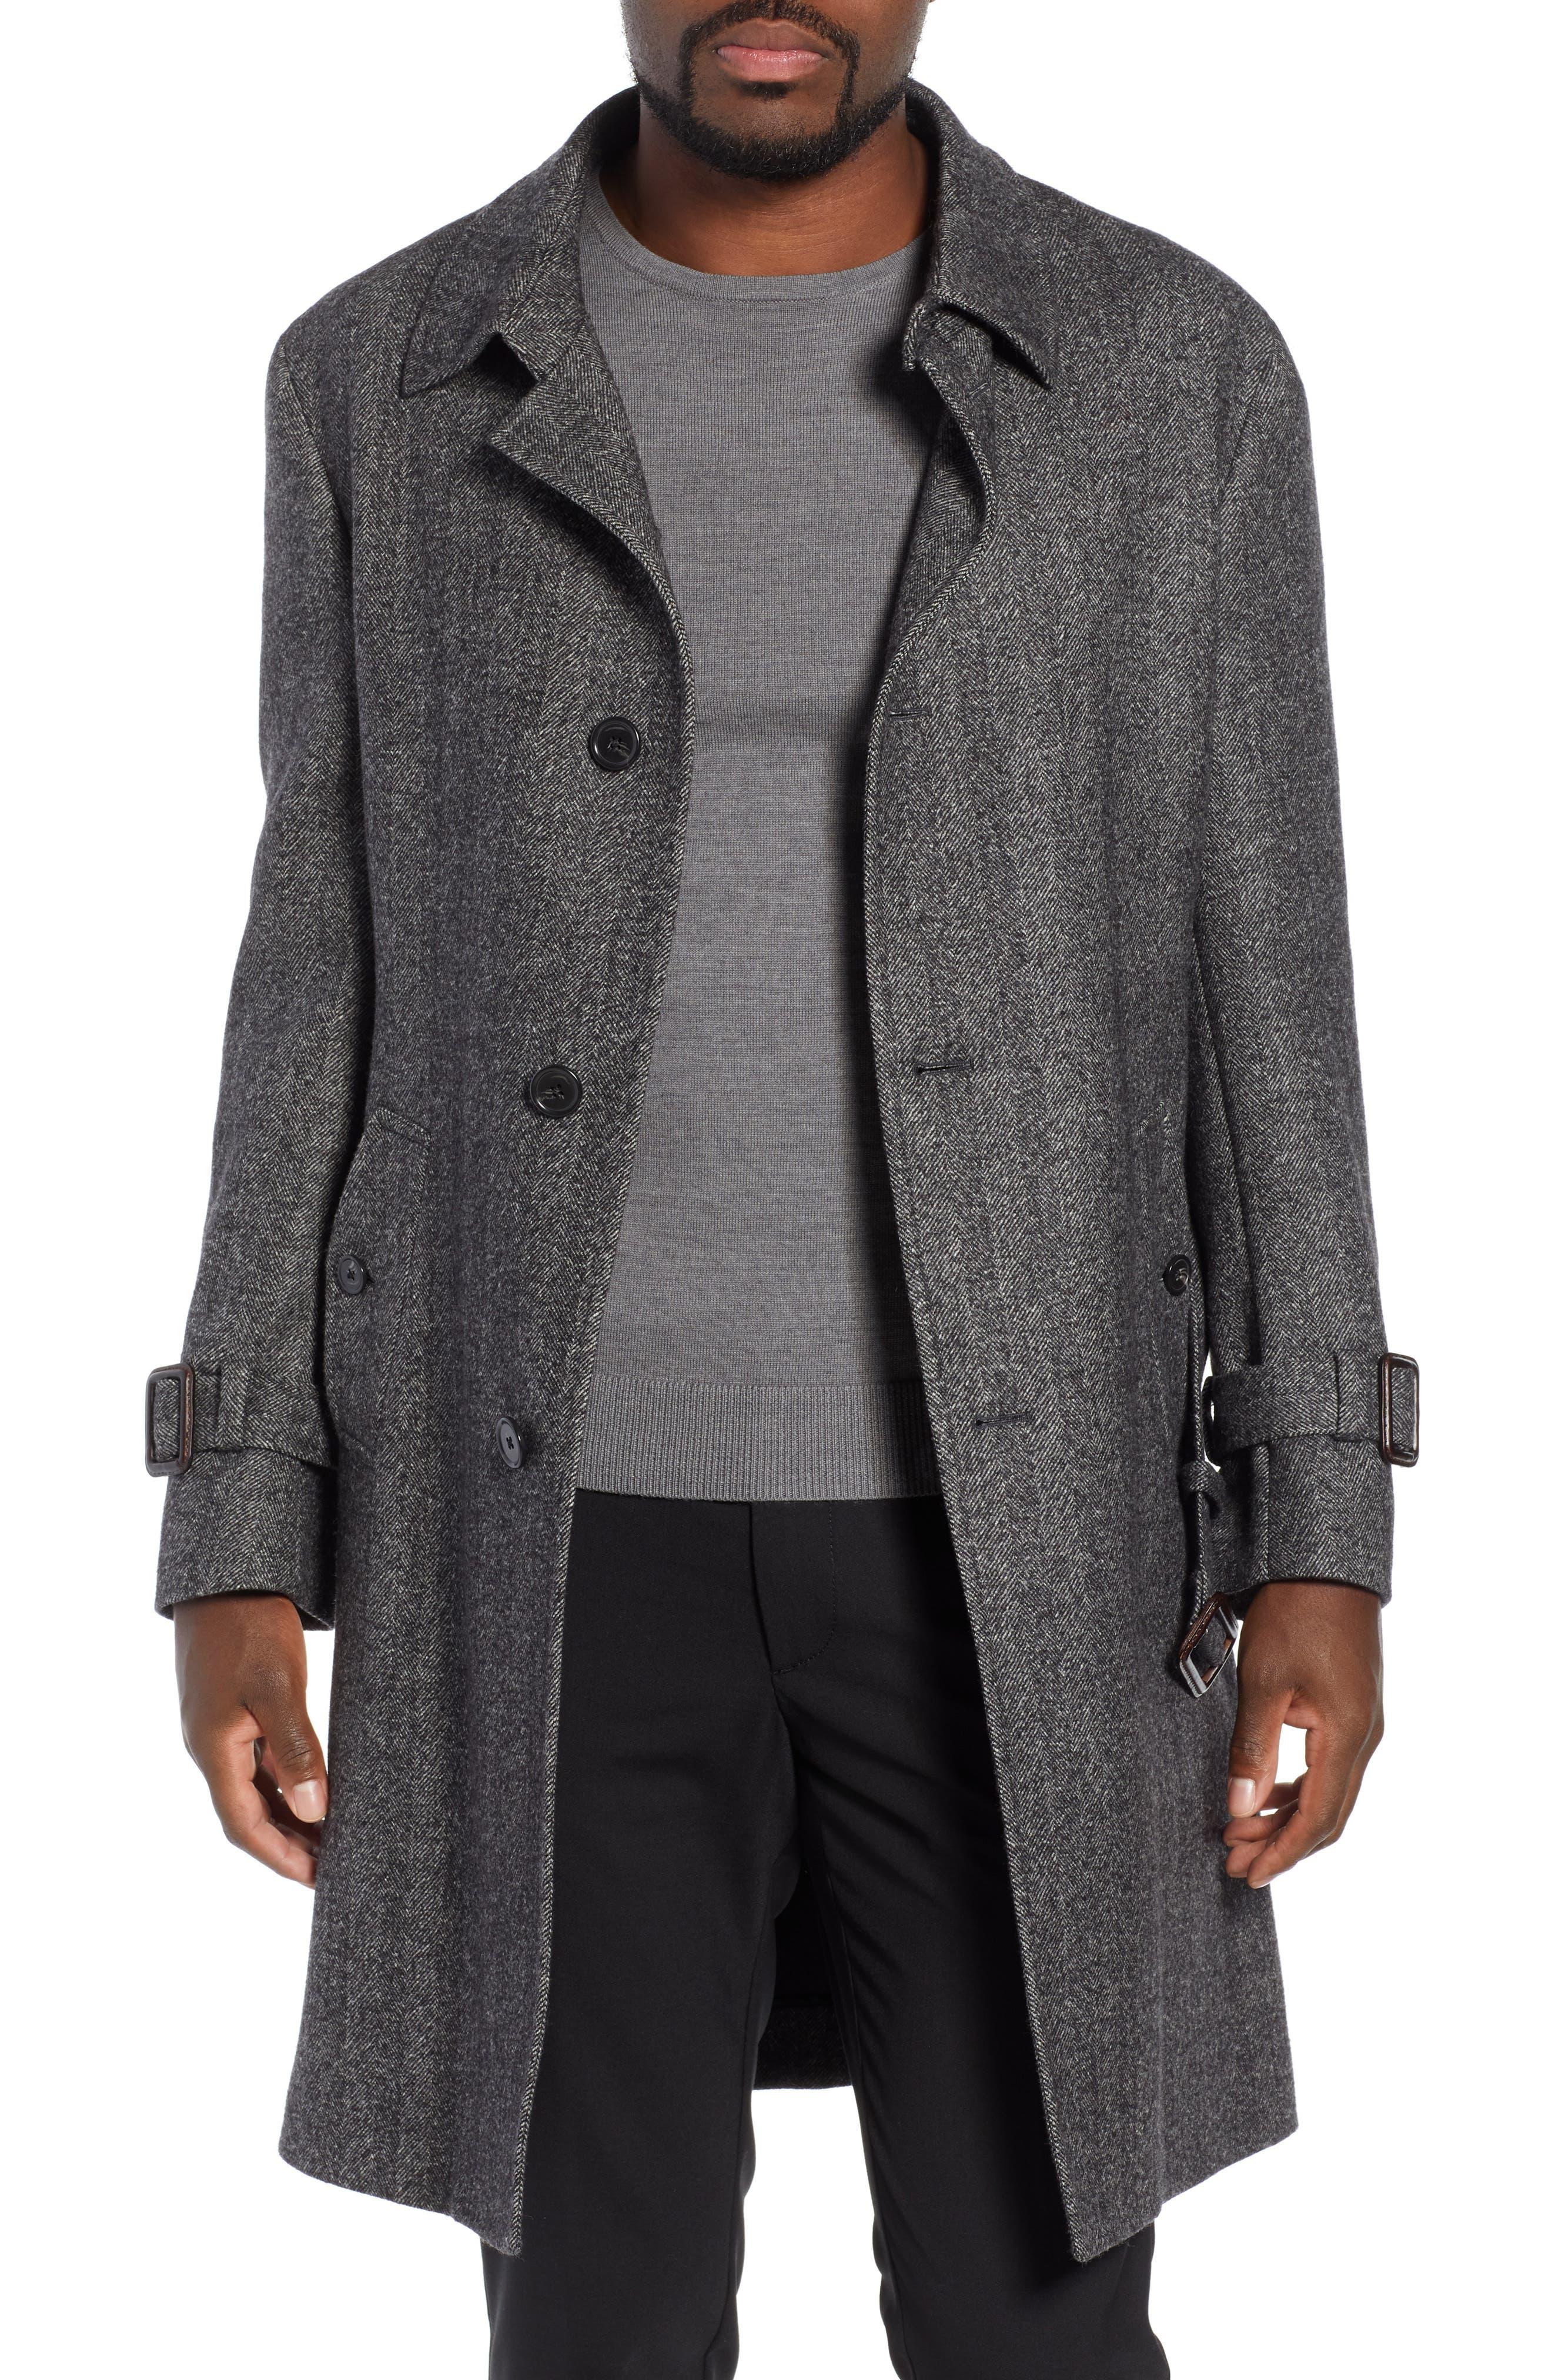 Zelander Herringbone Wool Blend Coat,                             Main thumbnail 1, color,                             GREY